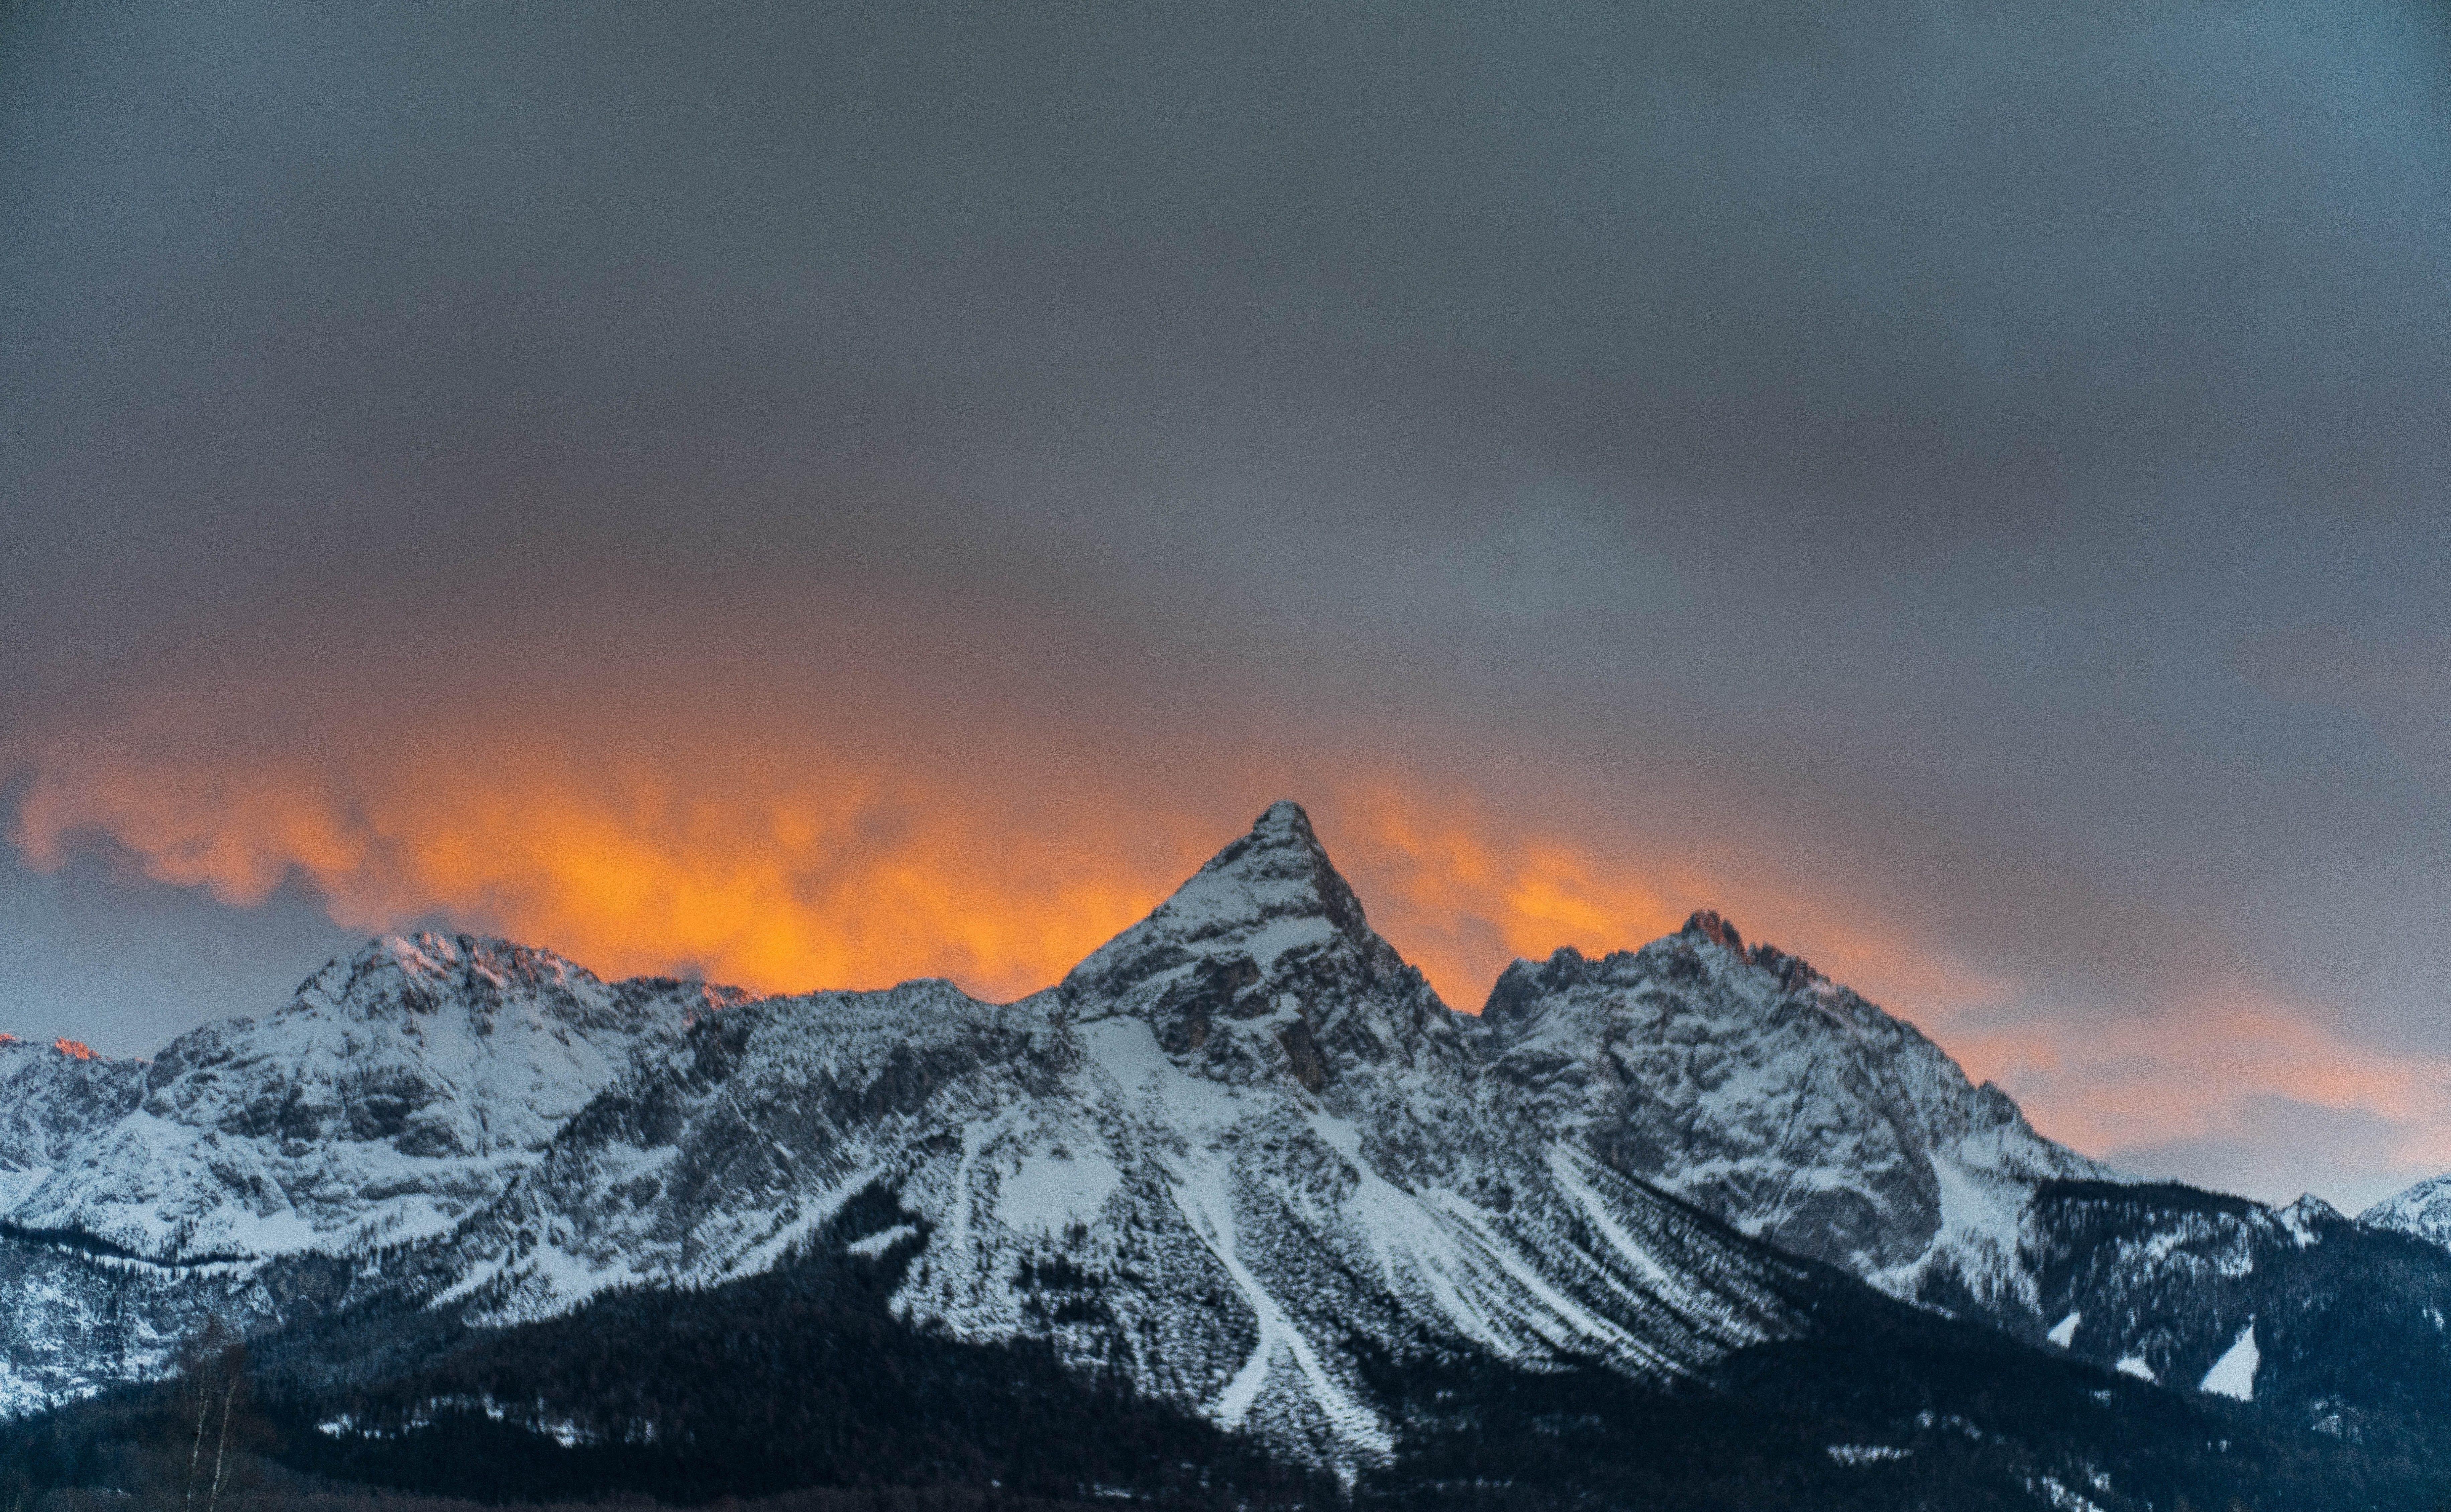 Snowy Mountain Under Dark Cloudy Sky